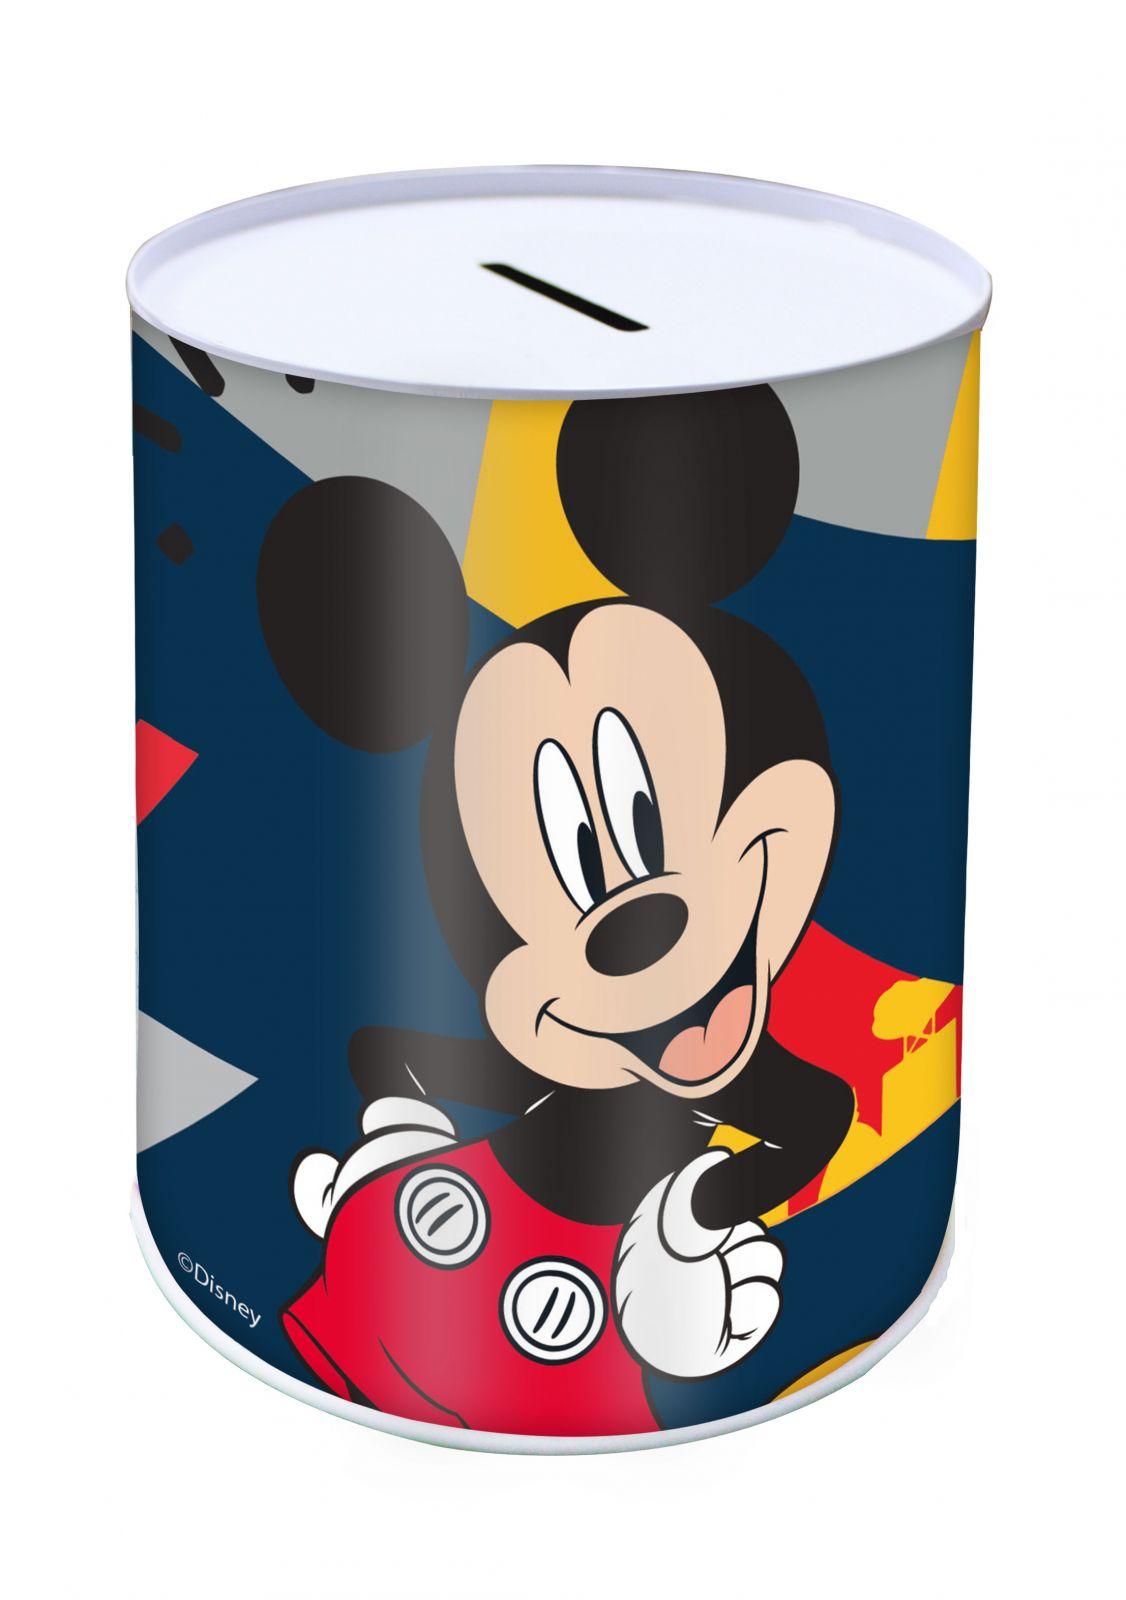 Pokladnička plechovka 10 x 15 cm - Mickey Mouse Diakakis